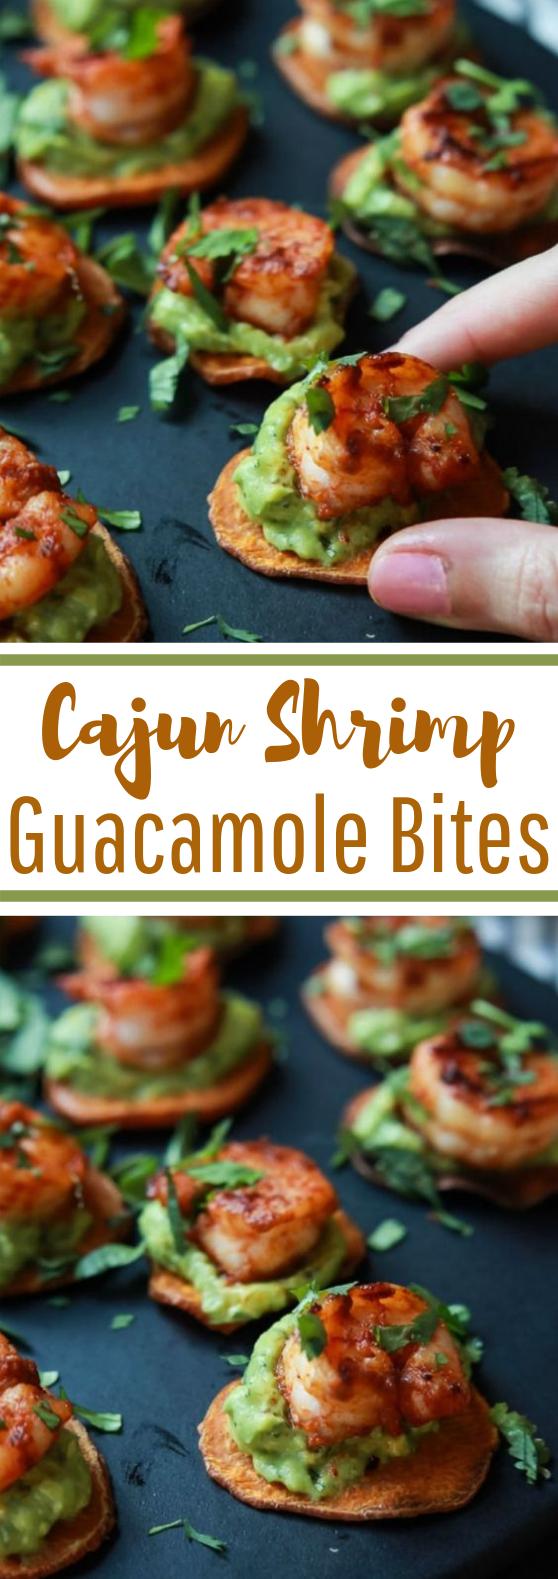 Cajun Shrimp Guacamole Bites #keto #lowcarb